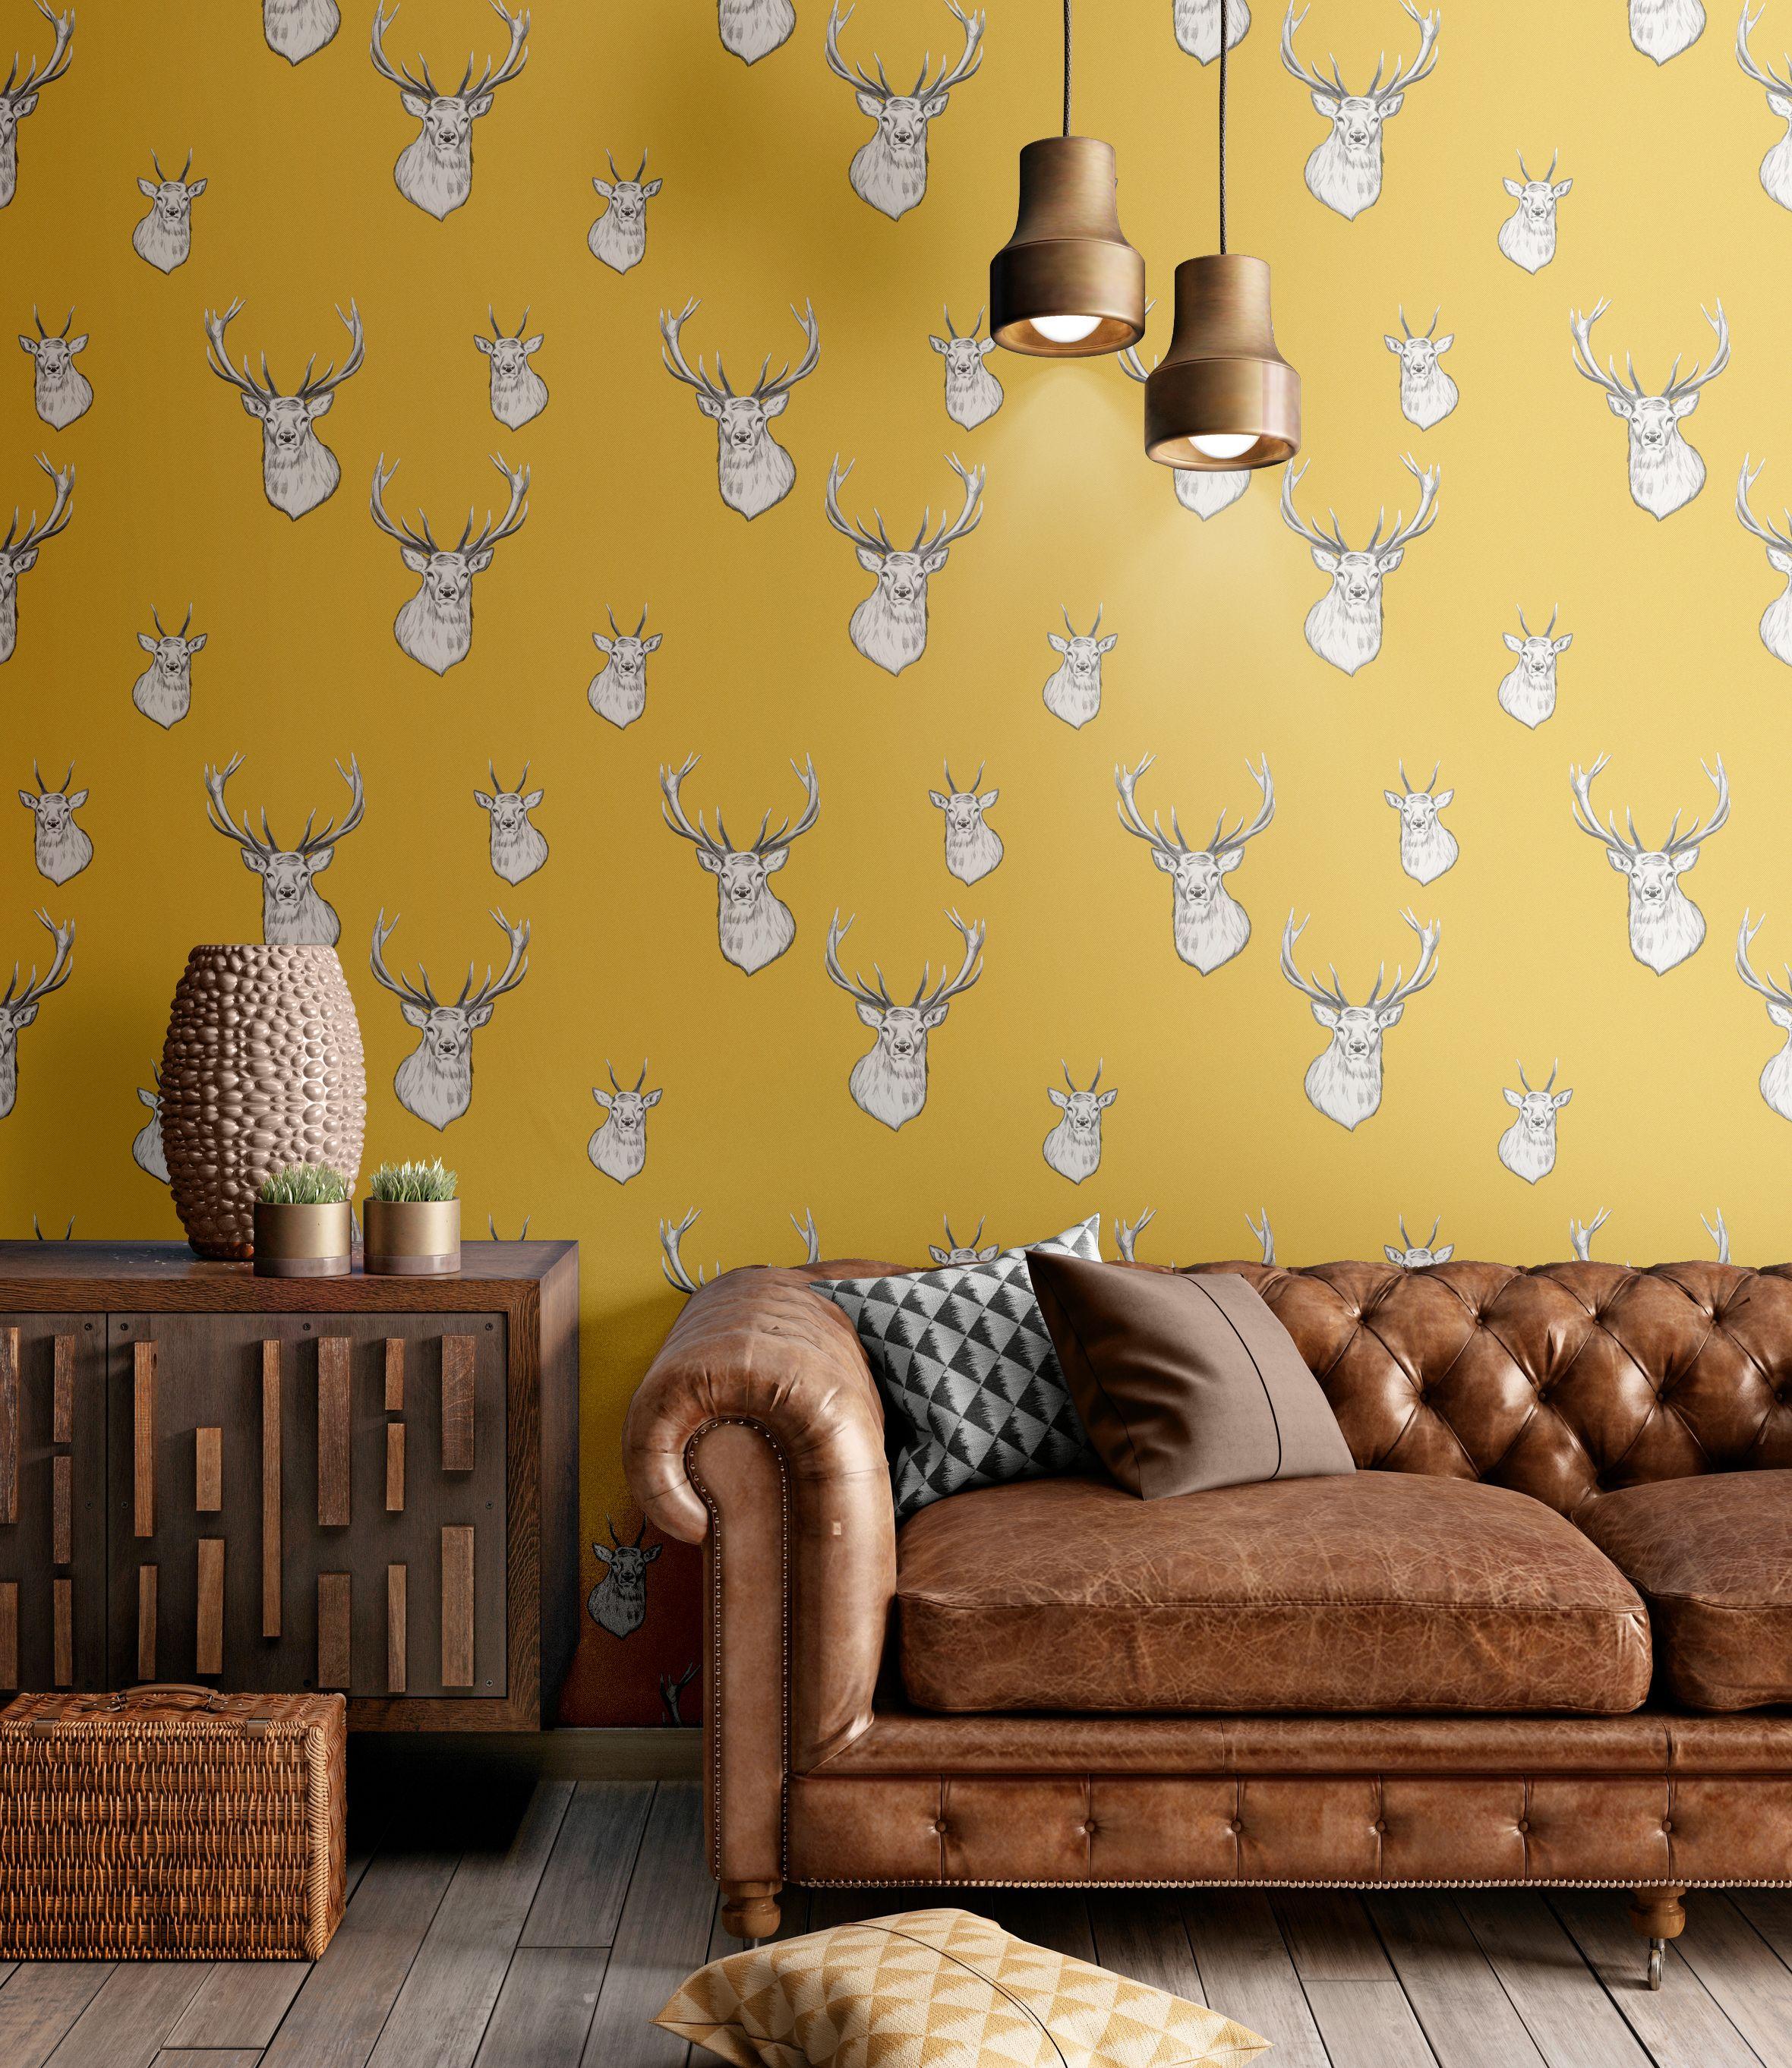 Stag Ochre Contemporary Wallpaper Designs Sophisticated Decor Home Wallpaper